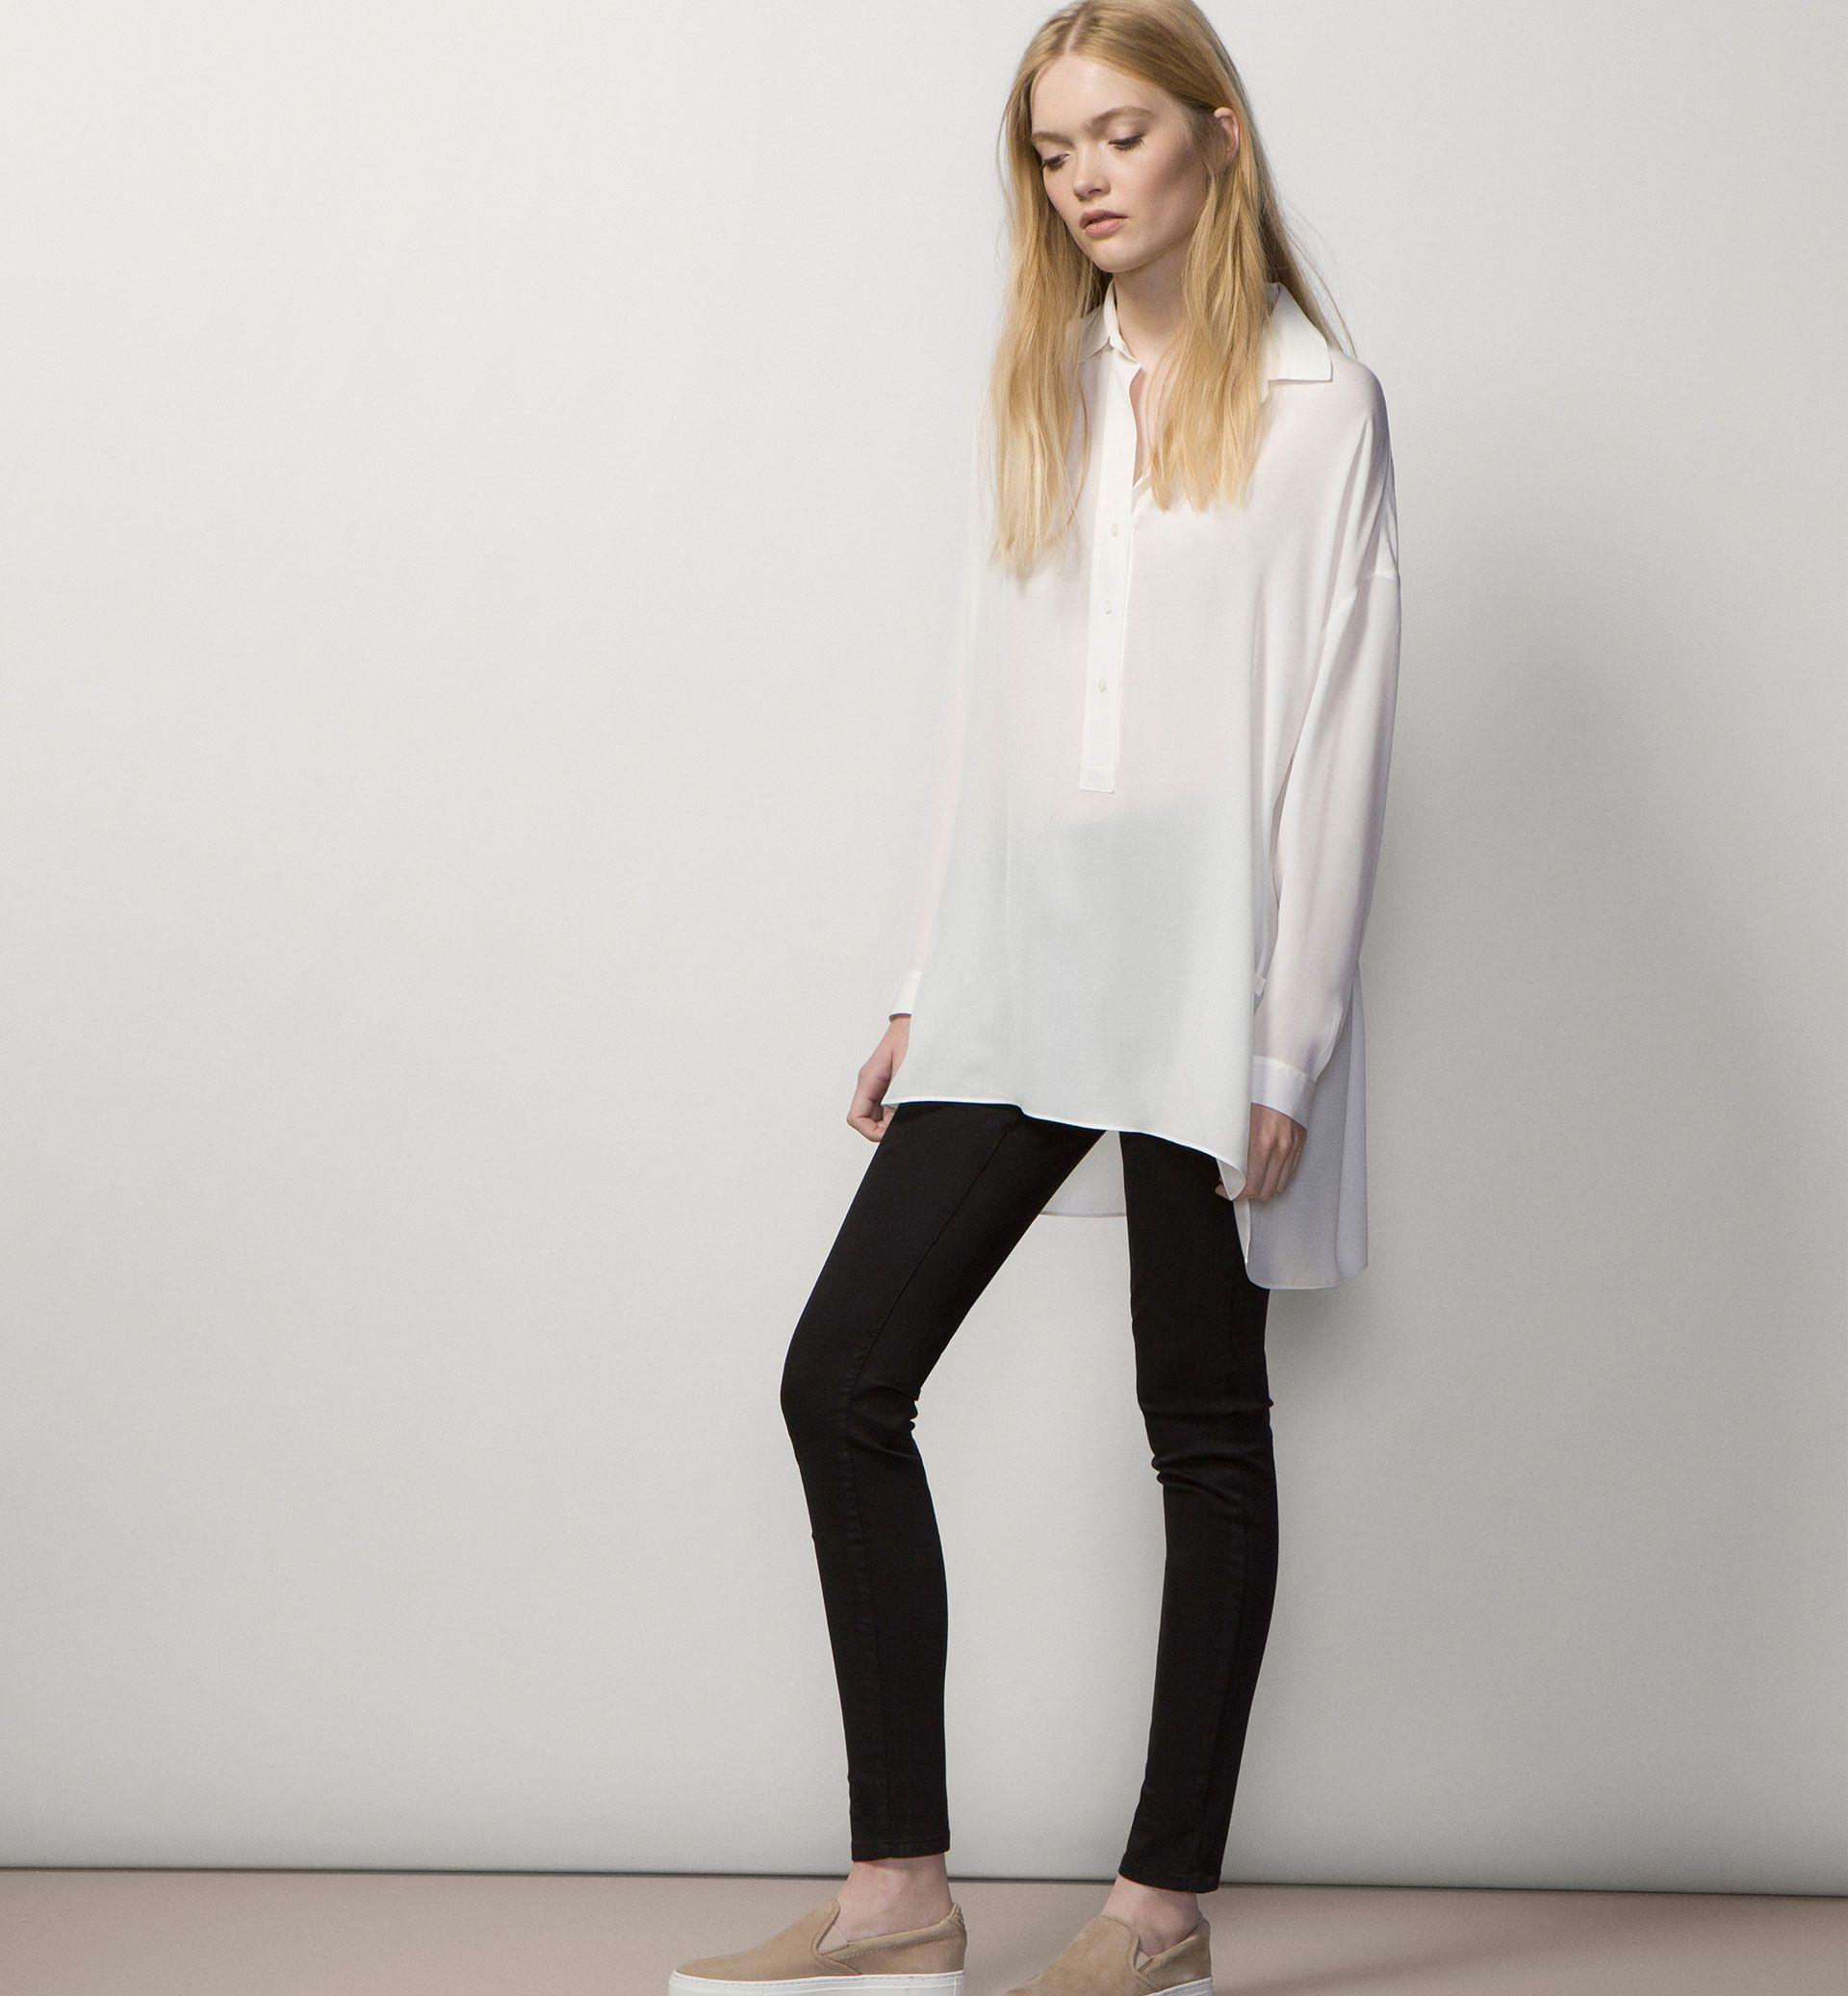 Satin Trousers Wardrobe Essentials Women Spain Massimo Dutti Satin Trousers Wardrobe Essentials Trousers